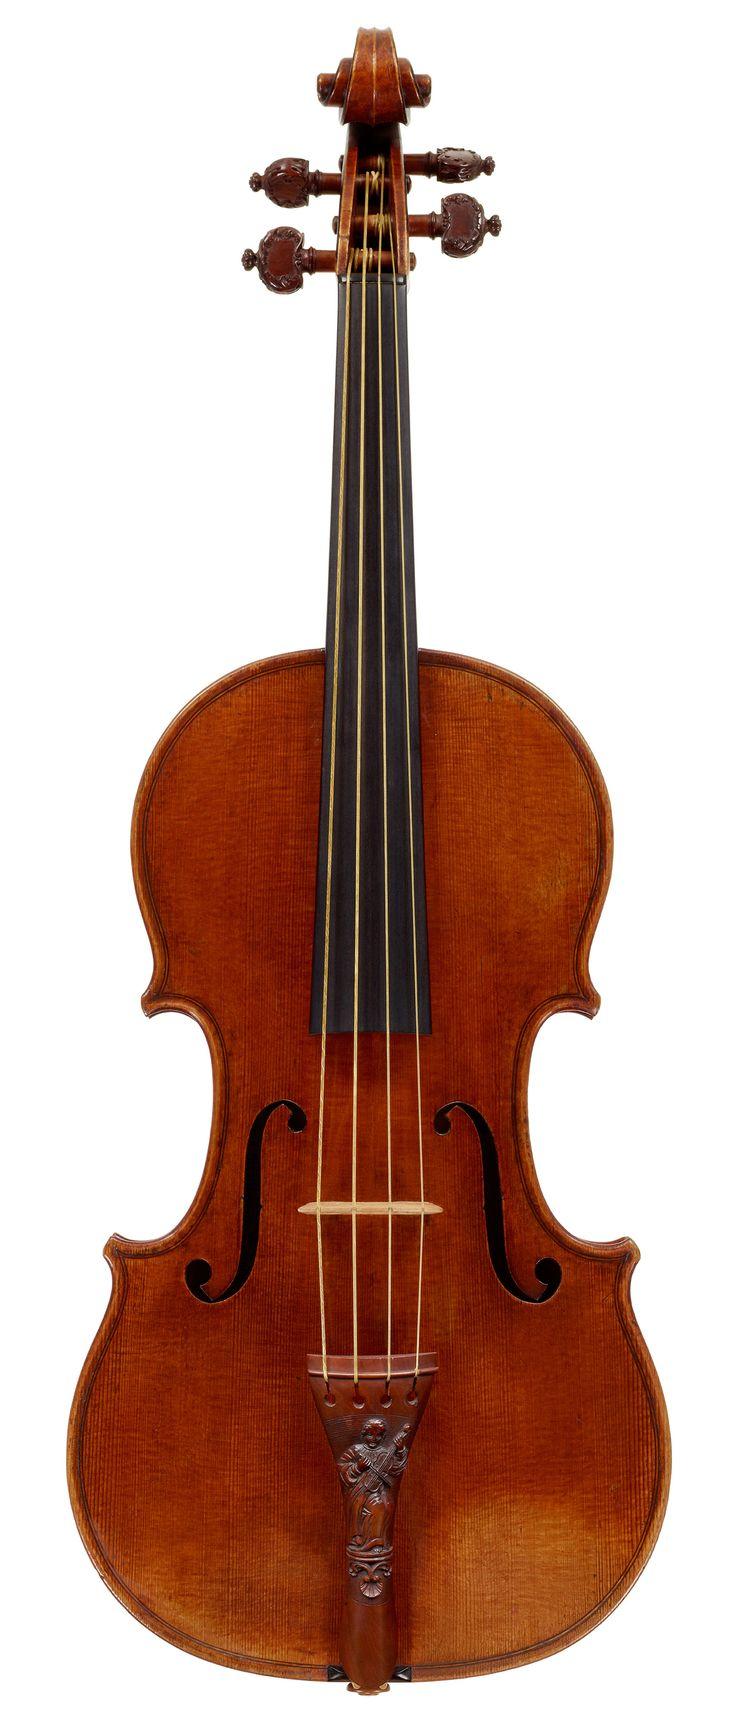 1721 Lady Blunt Stradivarius Violin - sold byTarisio Auctionson their 20 June 2011 online auction for £9.8 million (US$15.9 million),